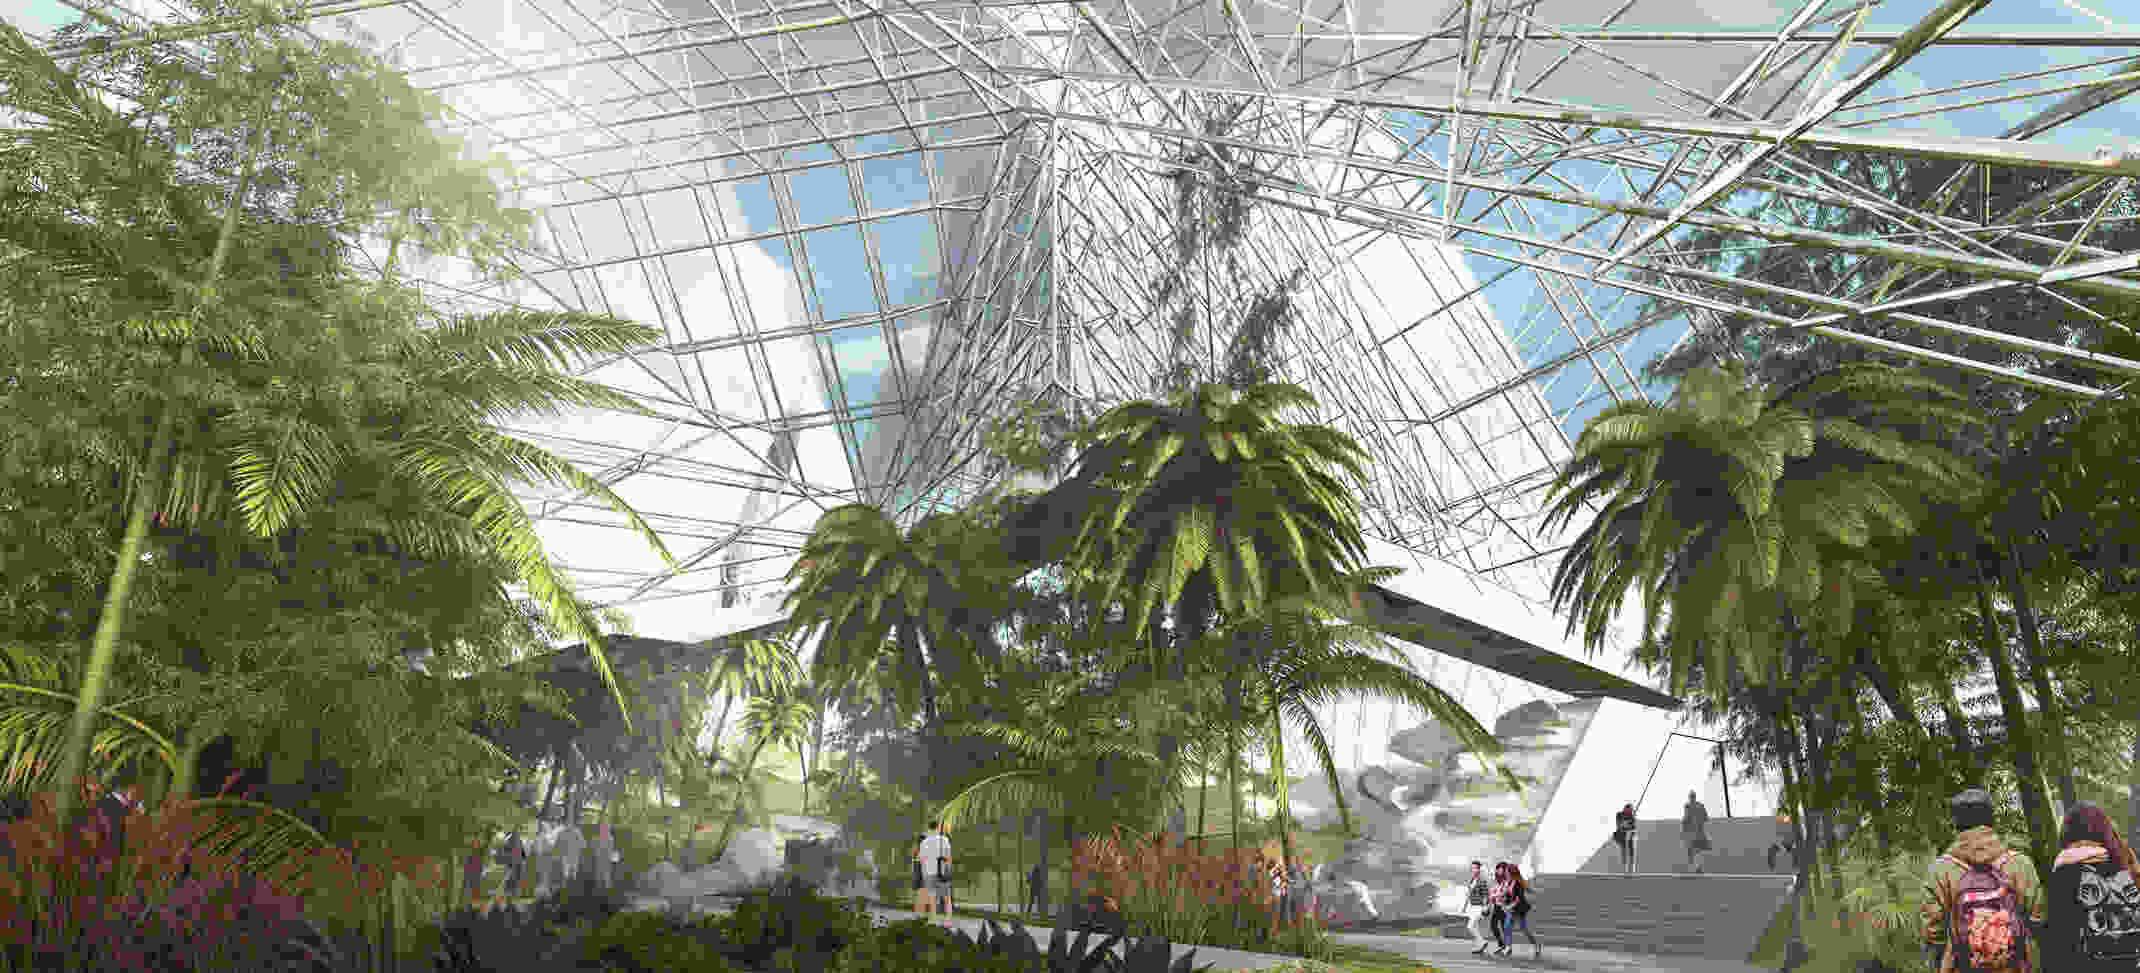 438 dm Greenhouse Ganzhou vis 005 greenhouse interior